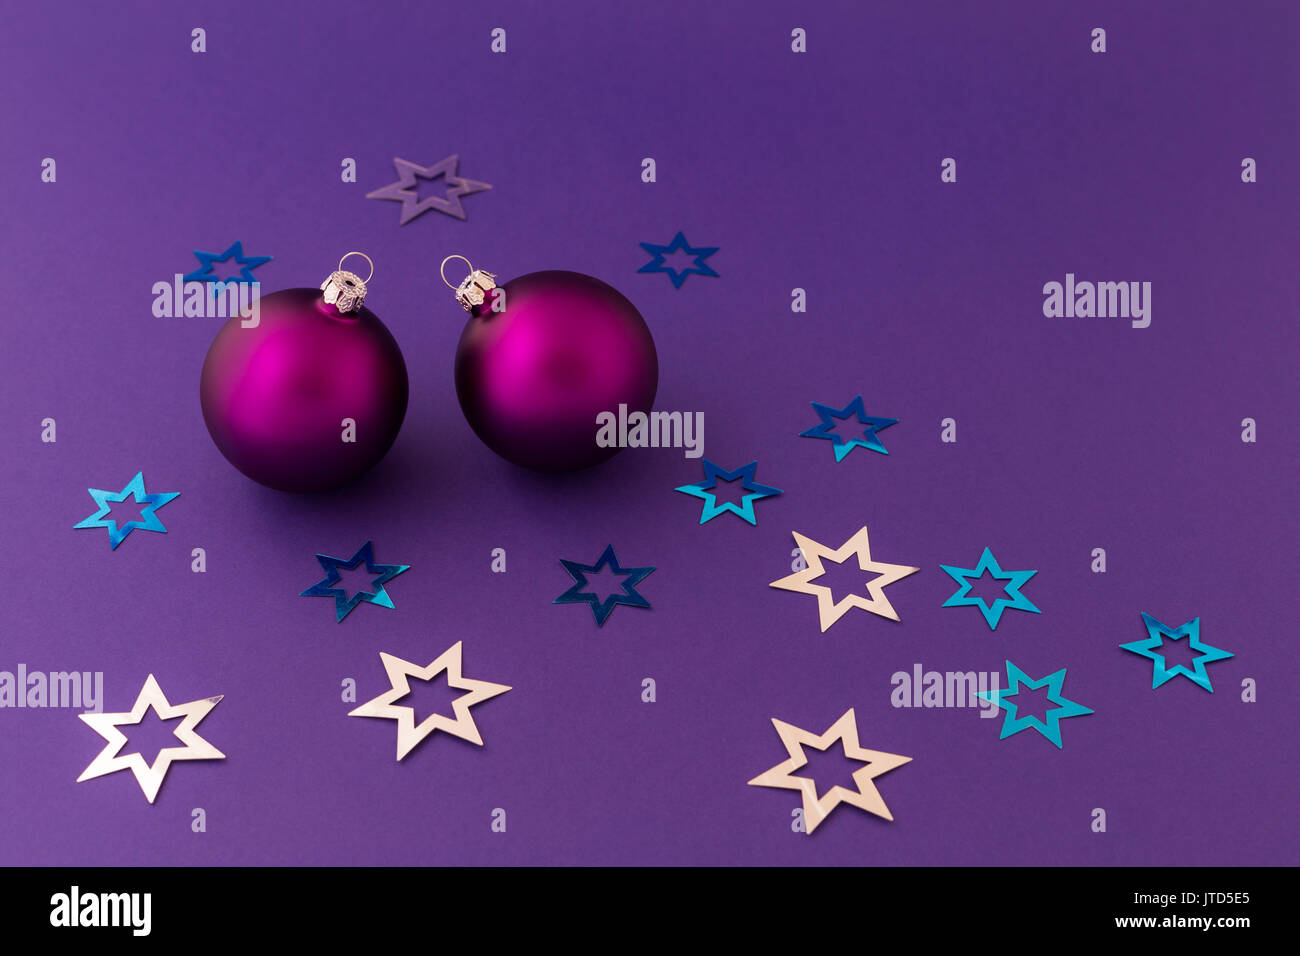 Beautiful purple christmas balls with satin effect and metallic beautiful purple christmas balls with satin effect and metallic silver and blue stars on purple background altavistaventures Choice Image